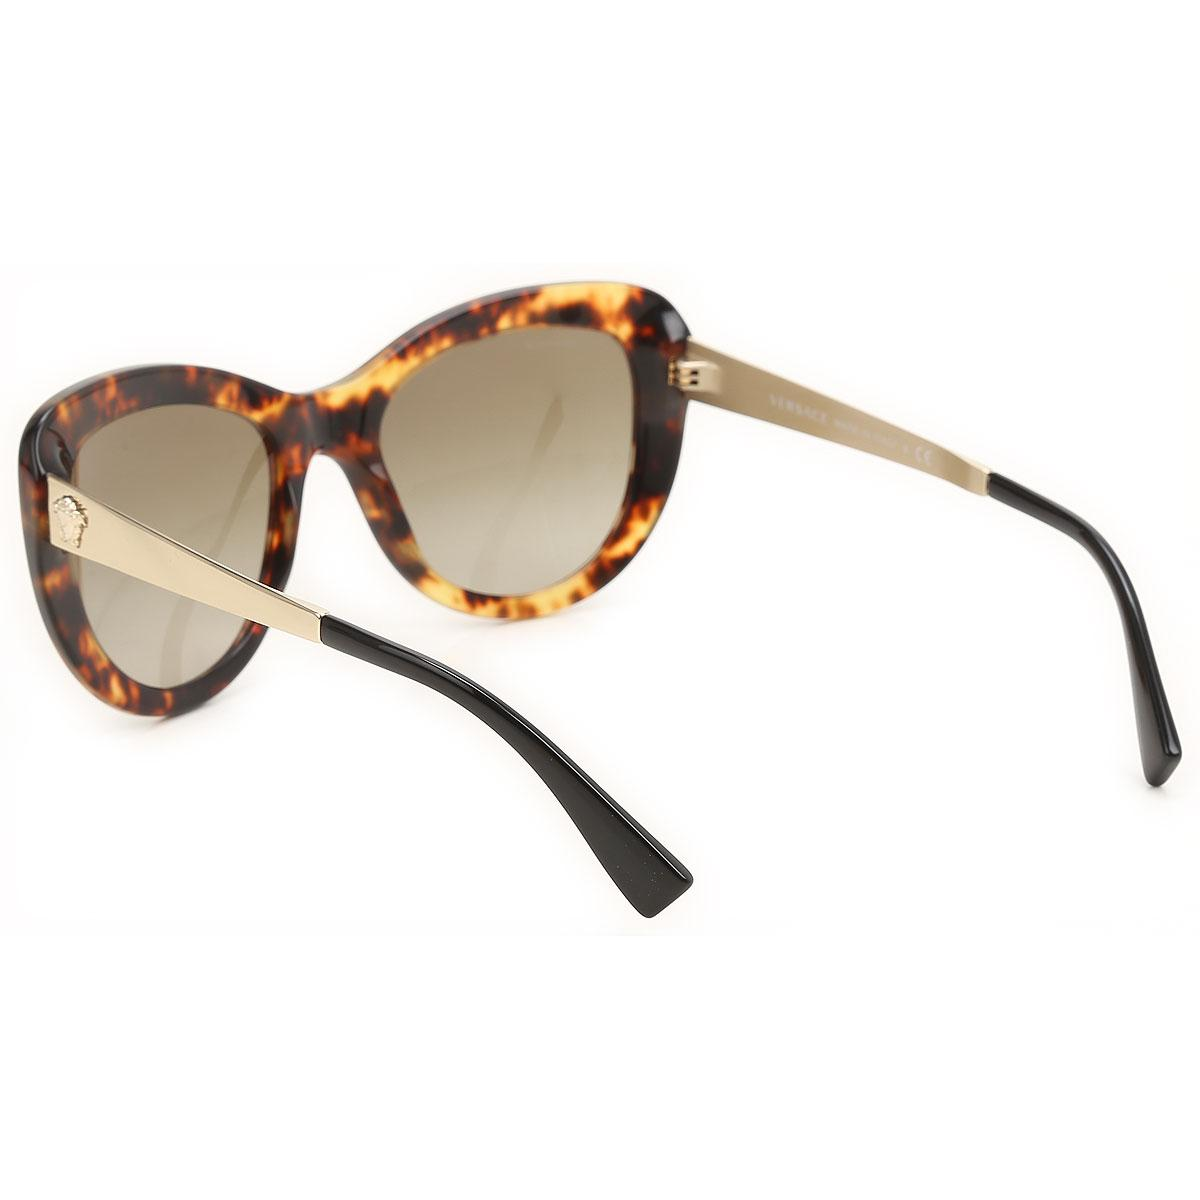 Versace Leather Sunglasses On Sale